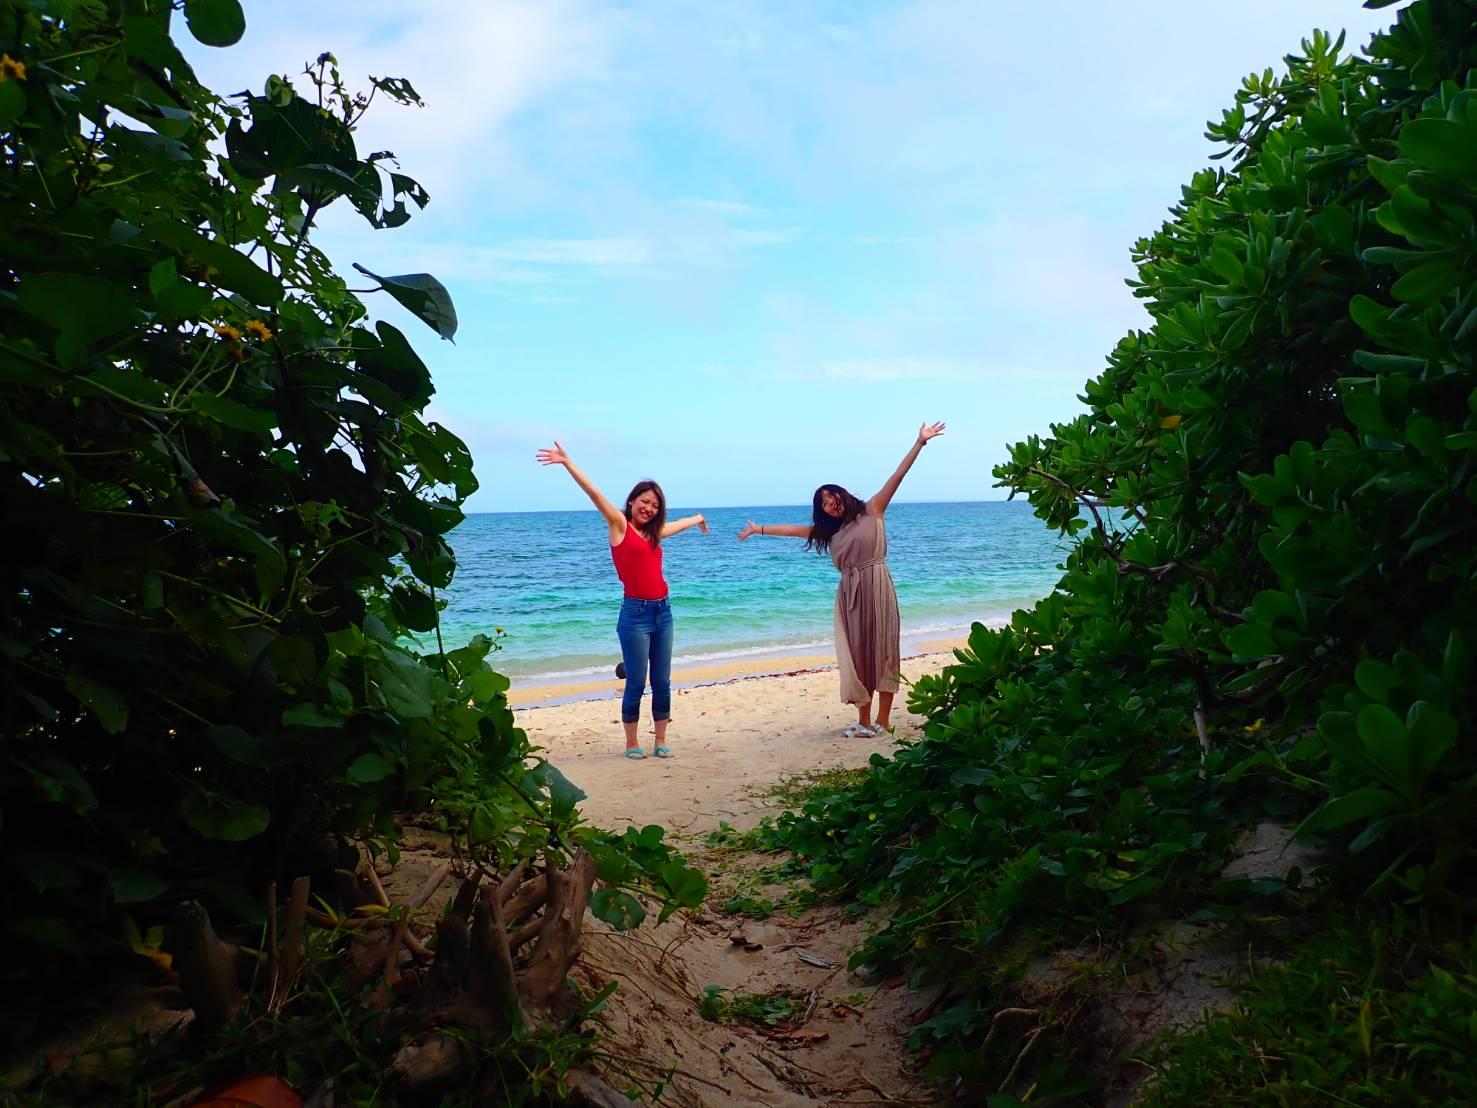 石垣島、海、女の子、女子旅